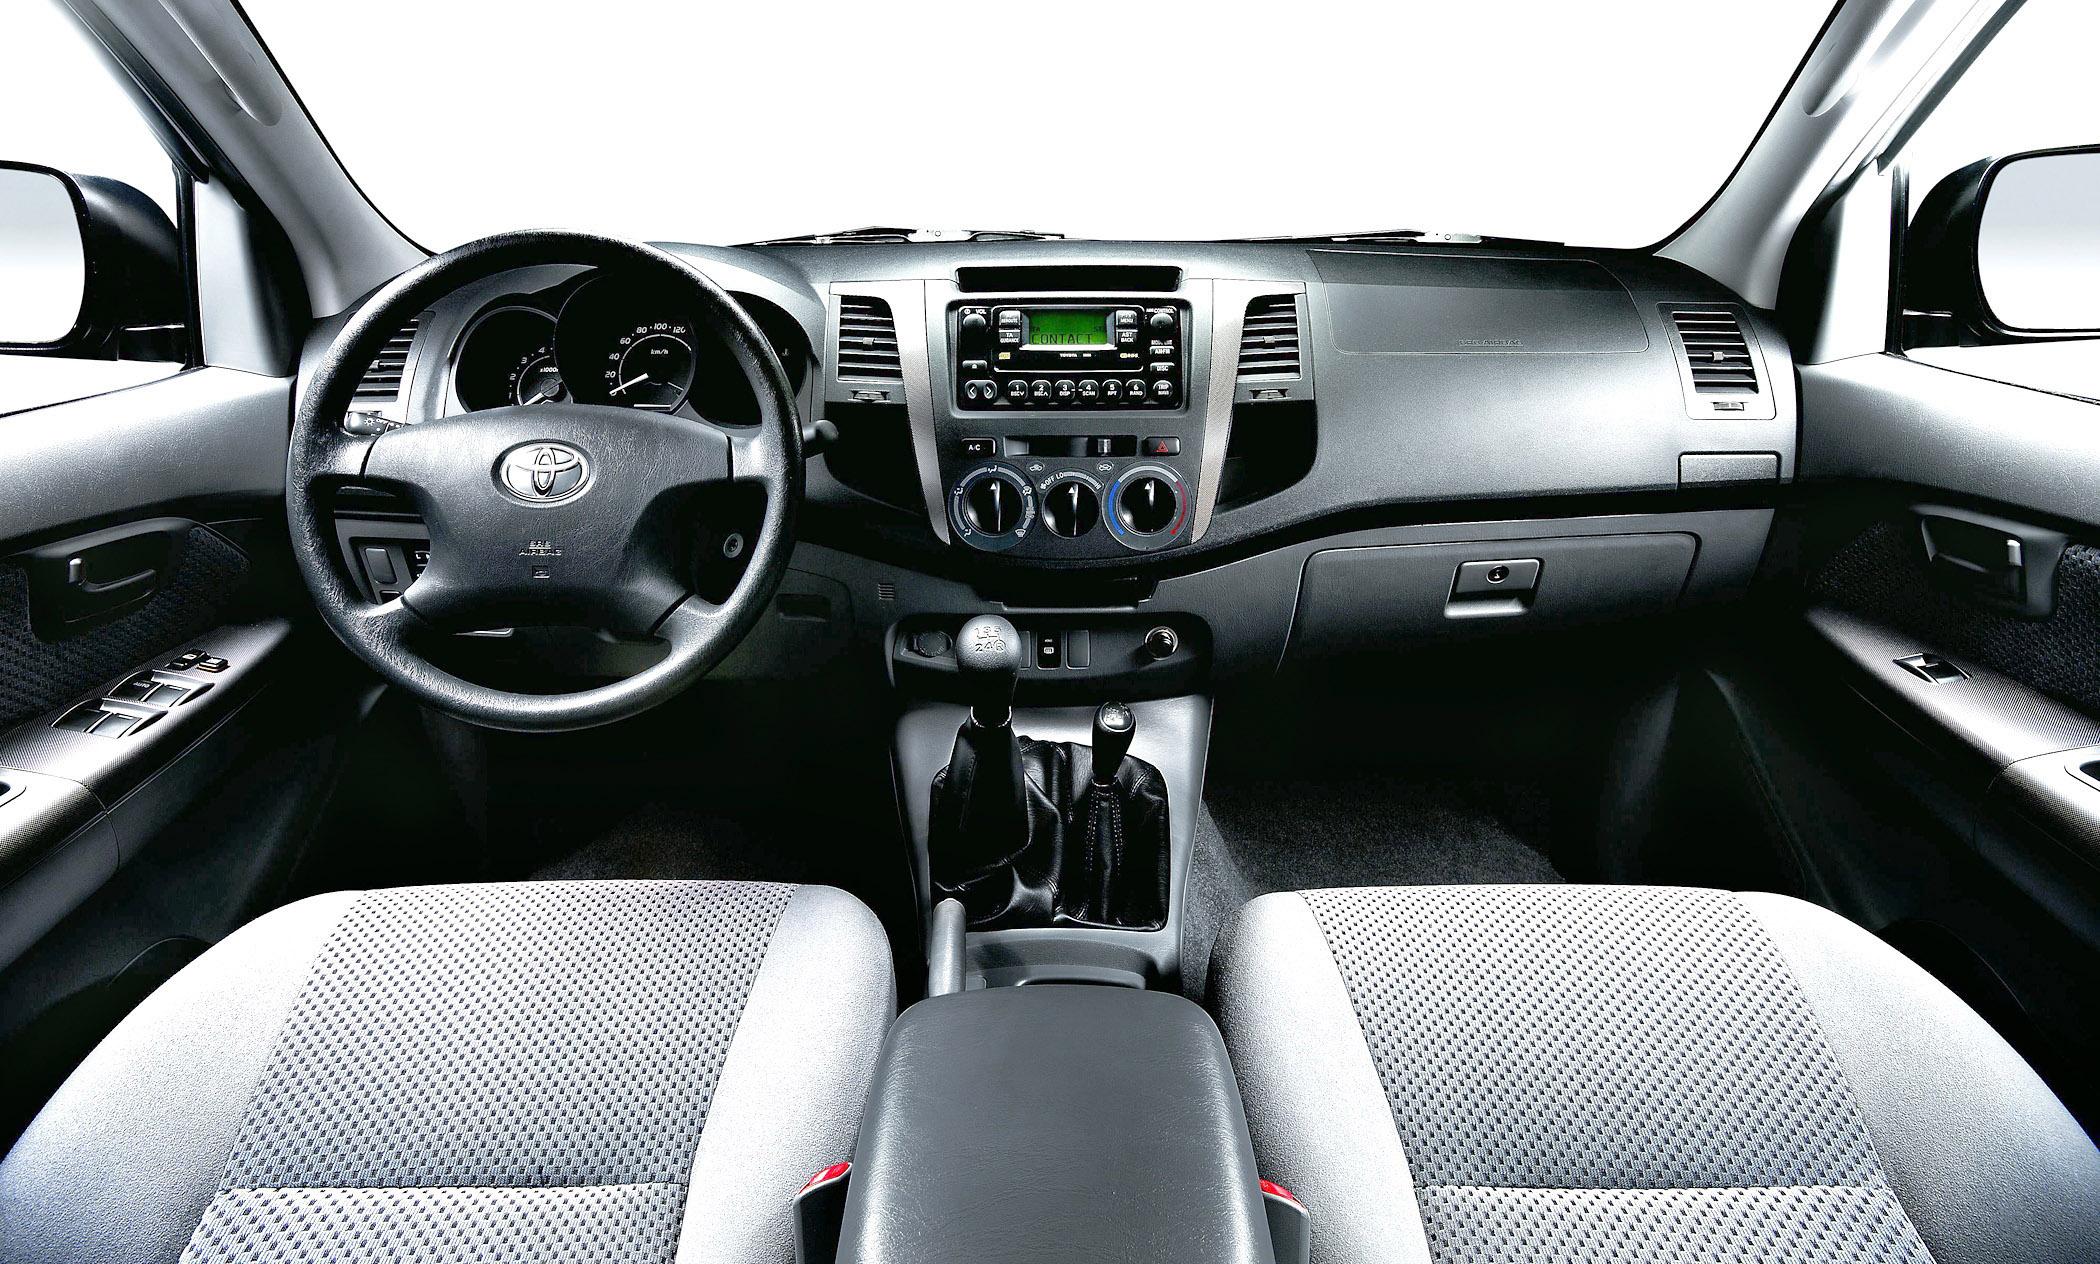 Kelebihan Toyota Hilux 2005 Murah Berkualitas